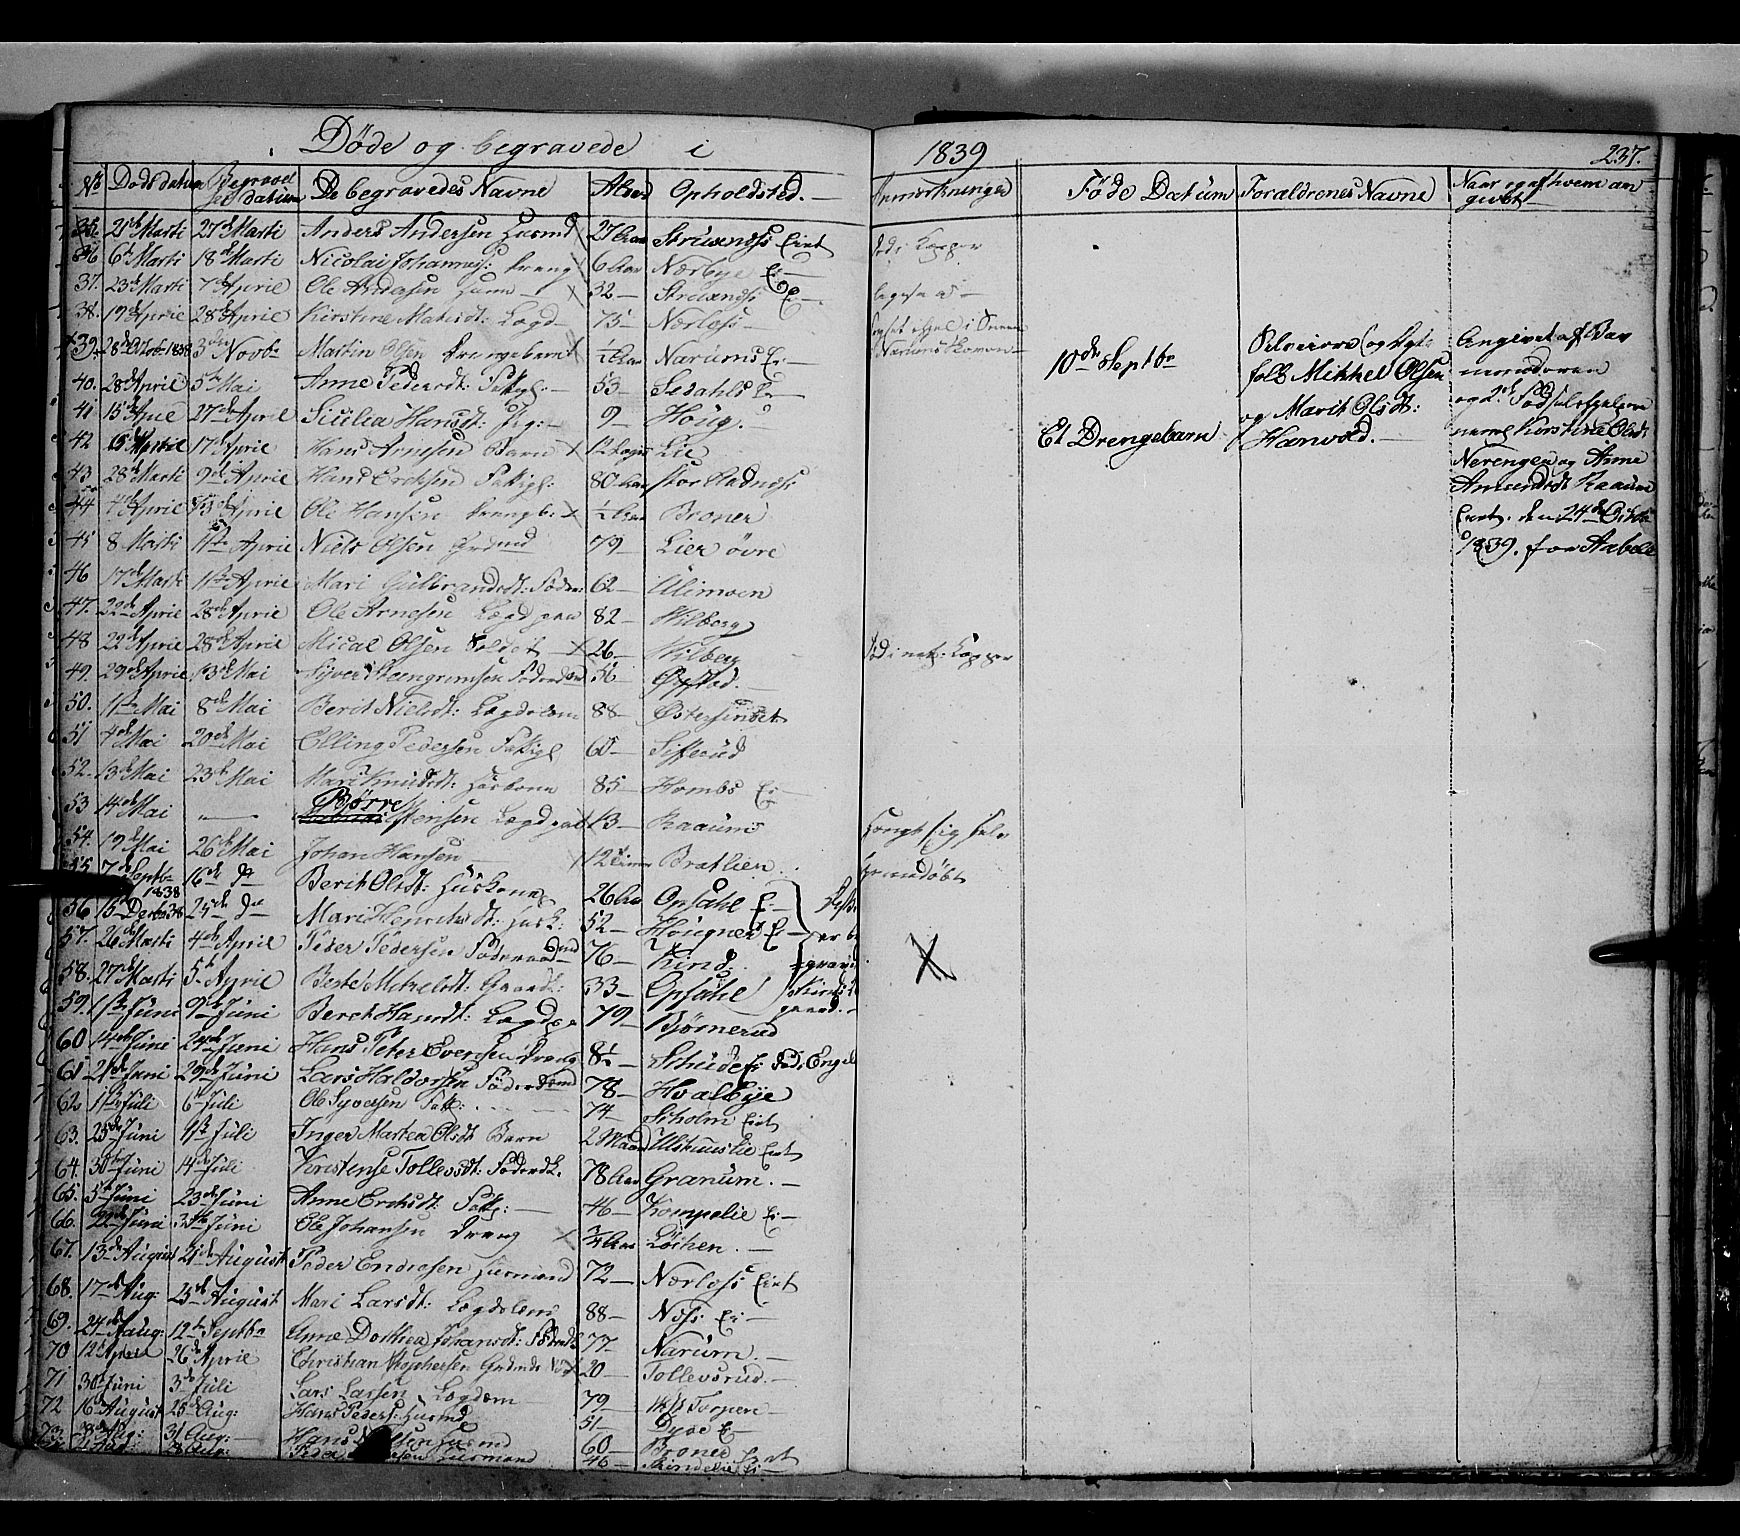 SAH, Land prestekontor, Klokkerbok nr. 2, 1833-1849, s. 237